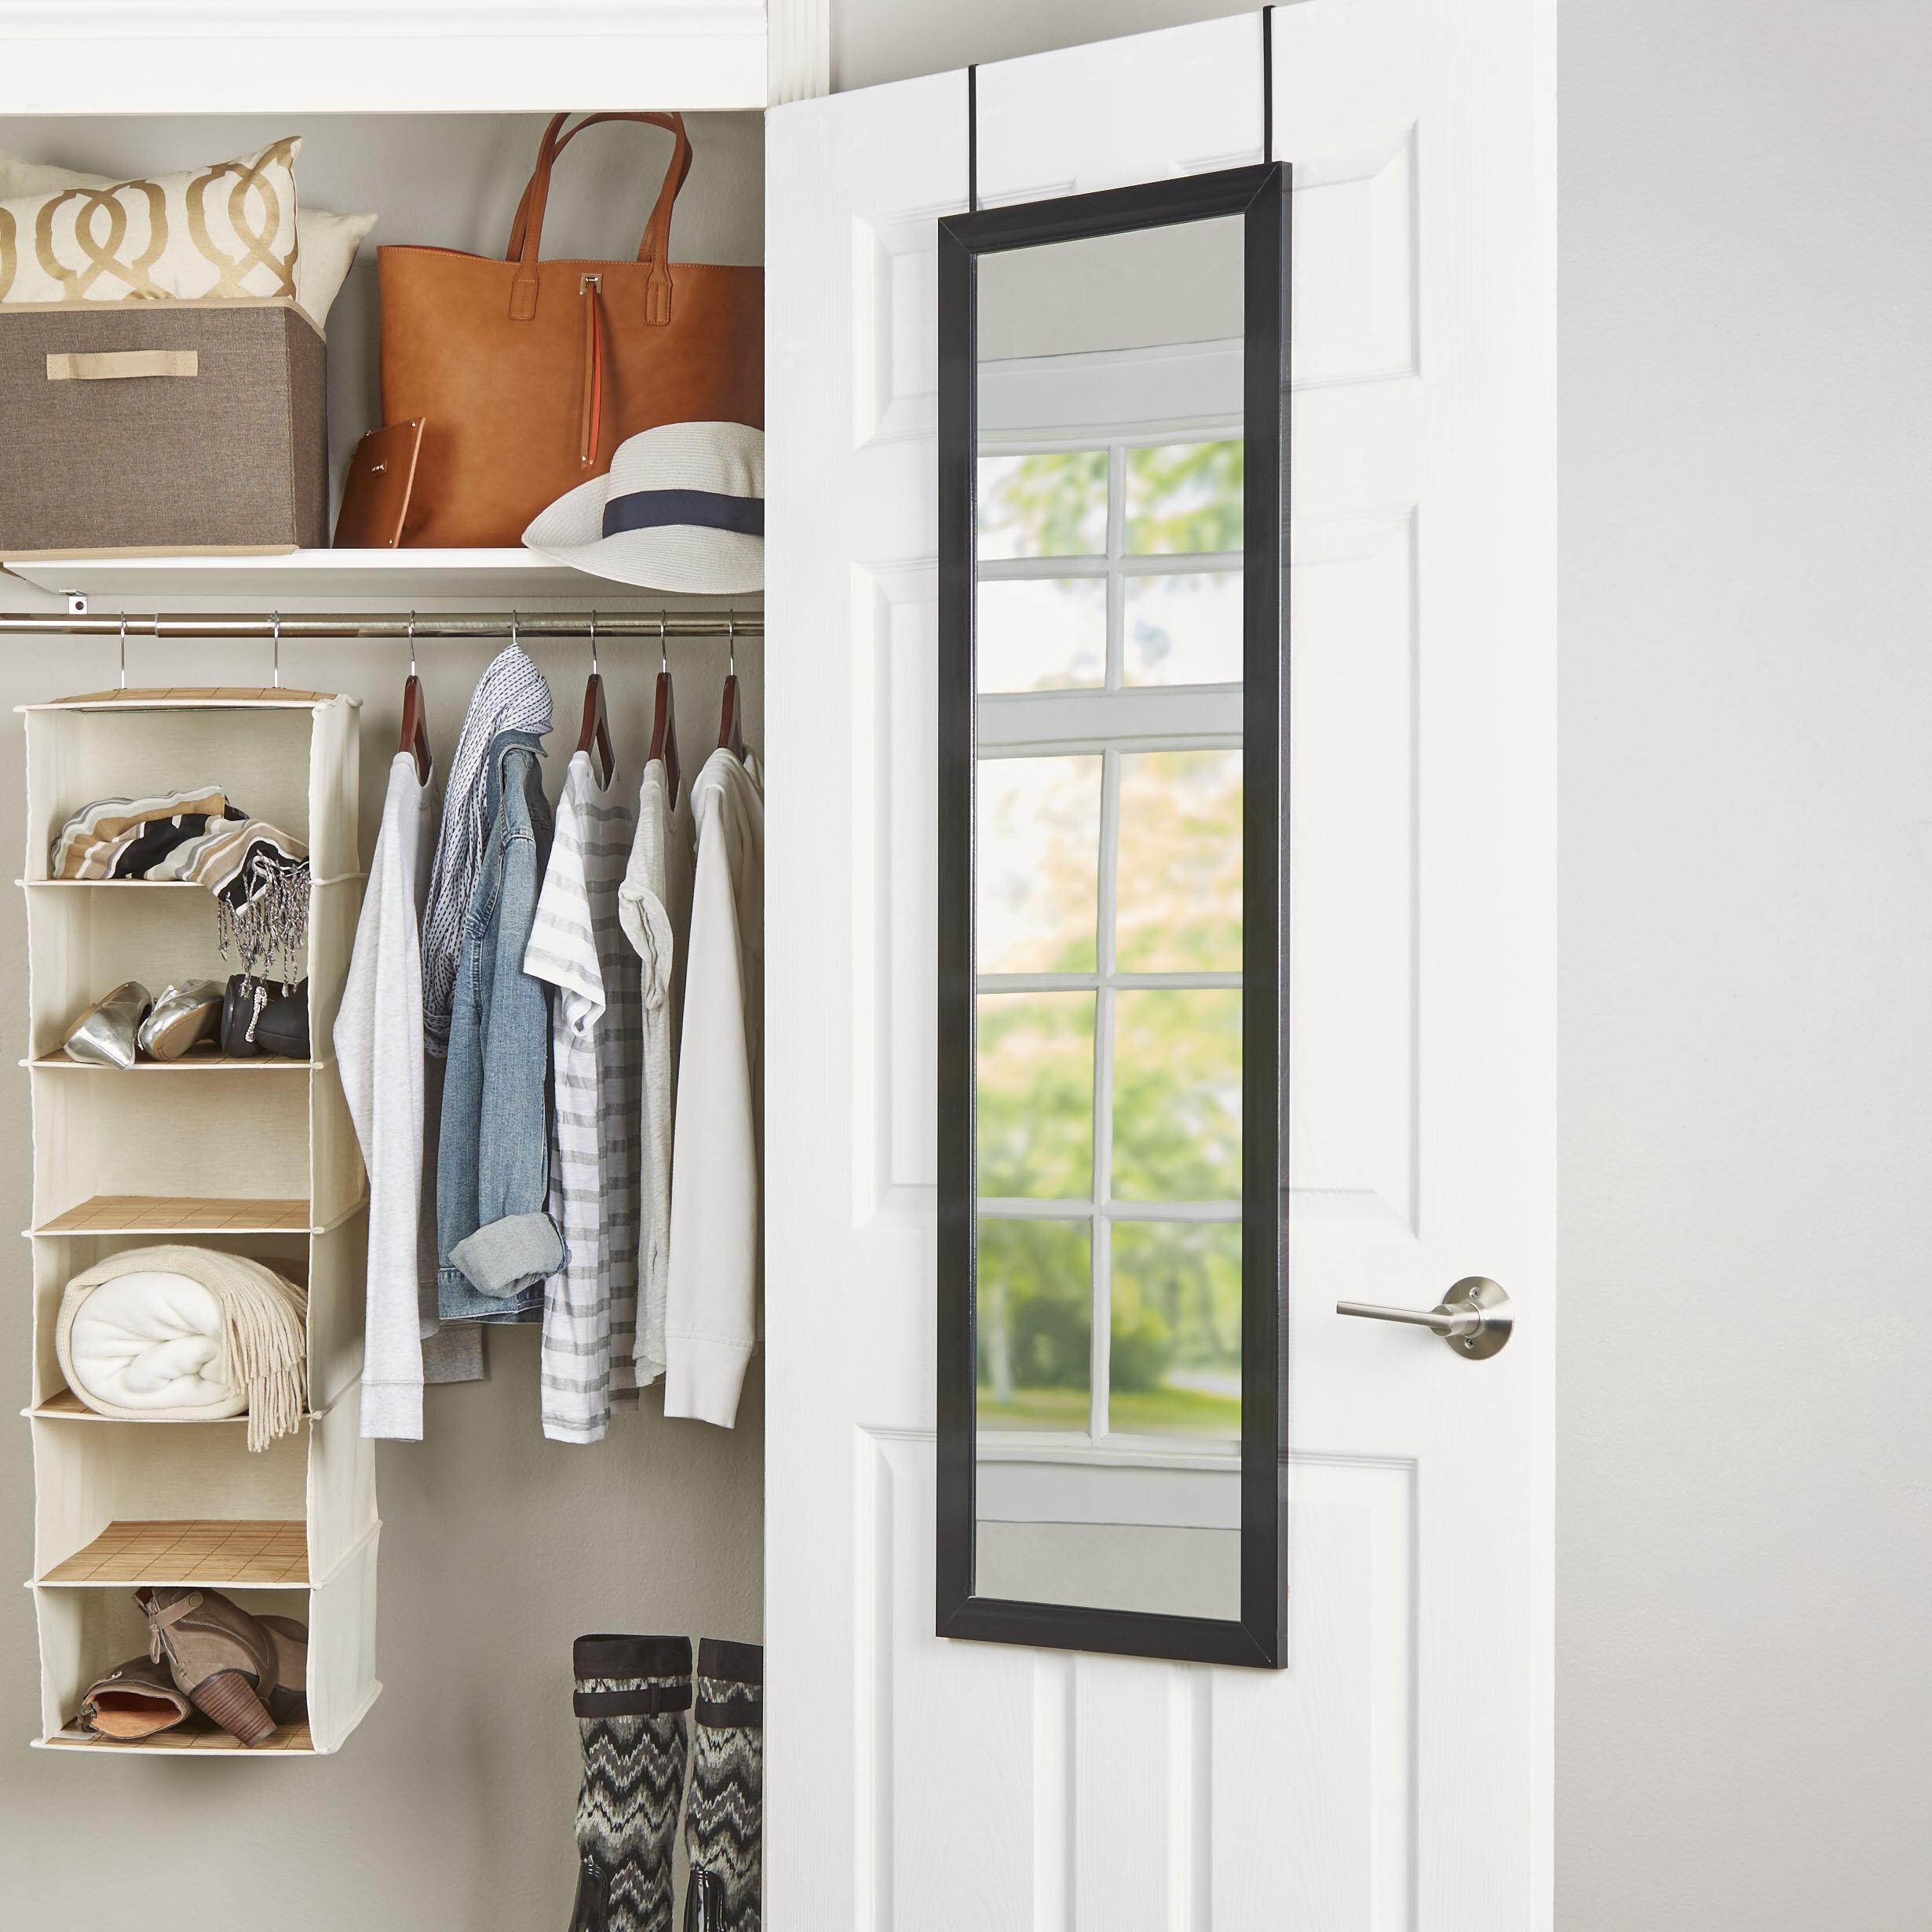 Charmant Wayfair Basics™ Wayfair Basics Over The Door Mirror U0026 Reviews | Wayfair